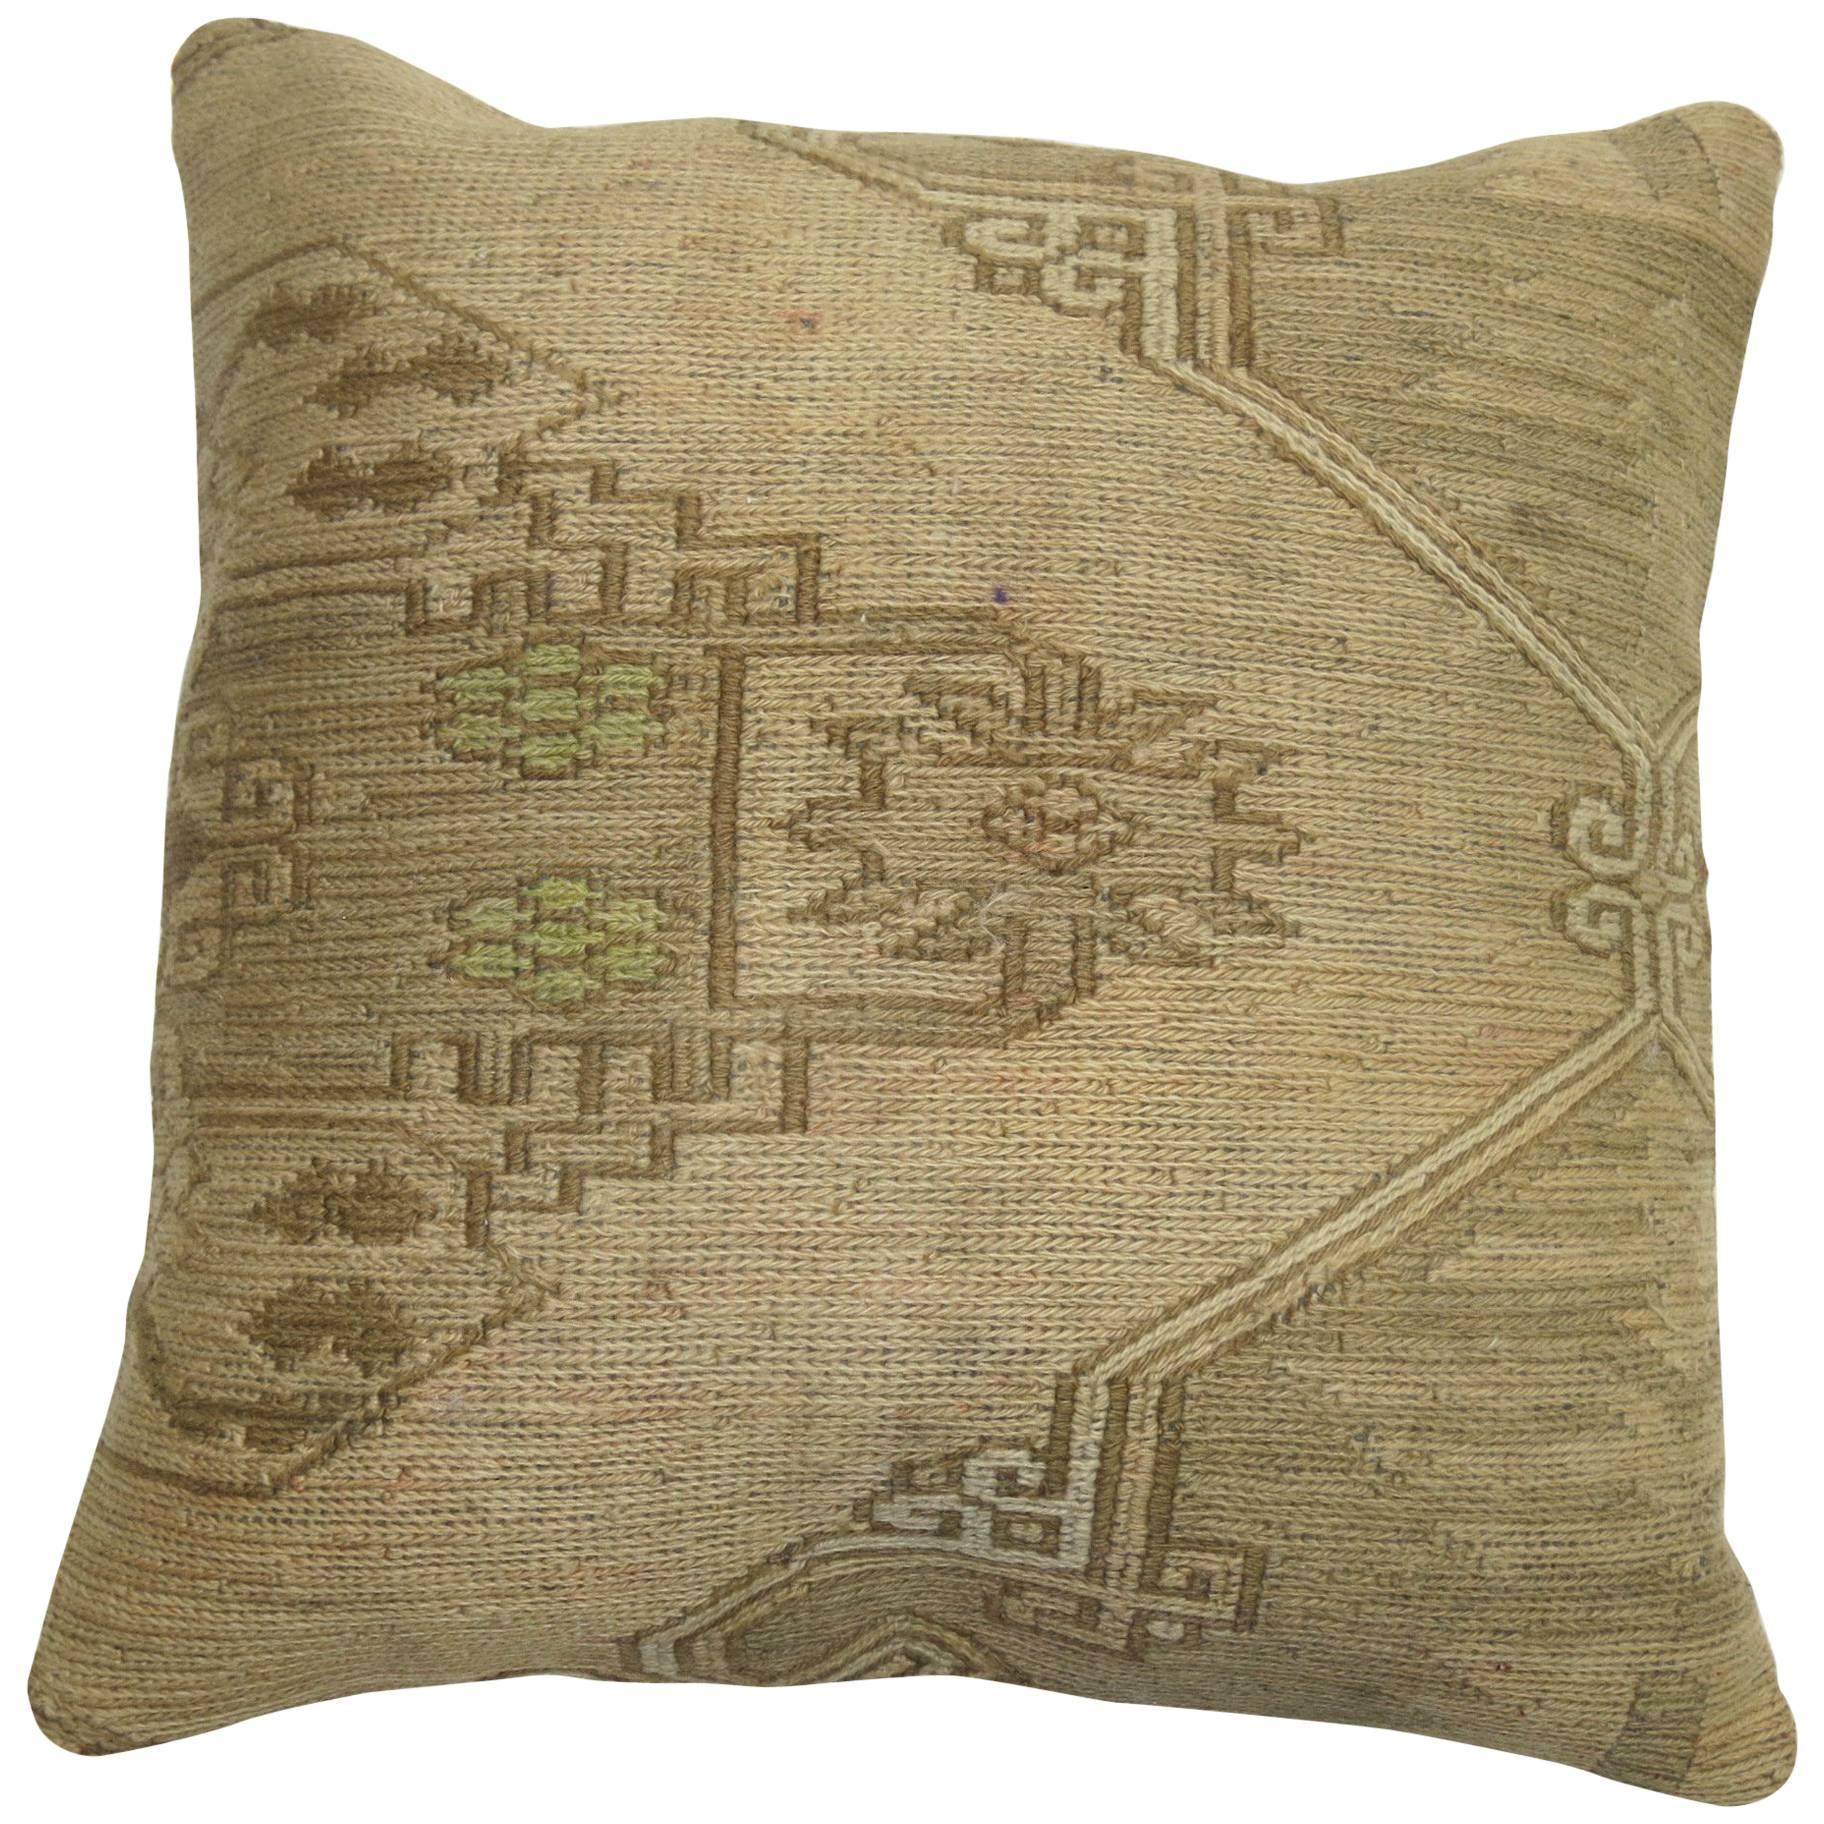 Persian Flat-Weave Rug Pillow